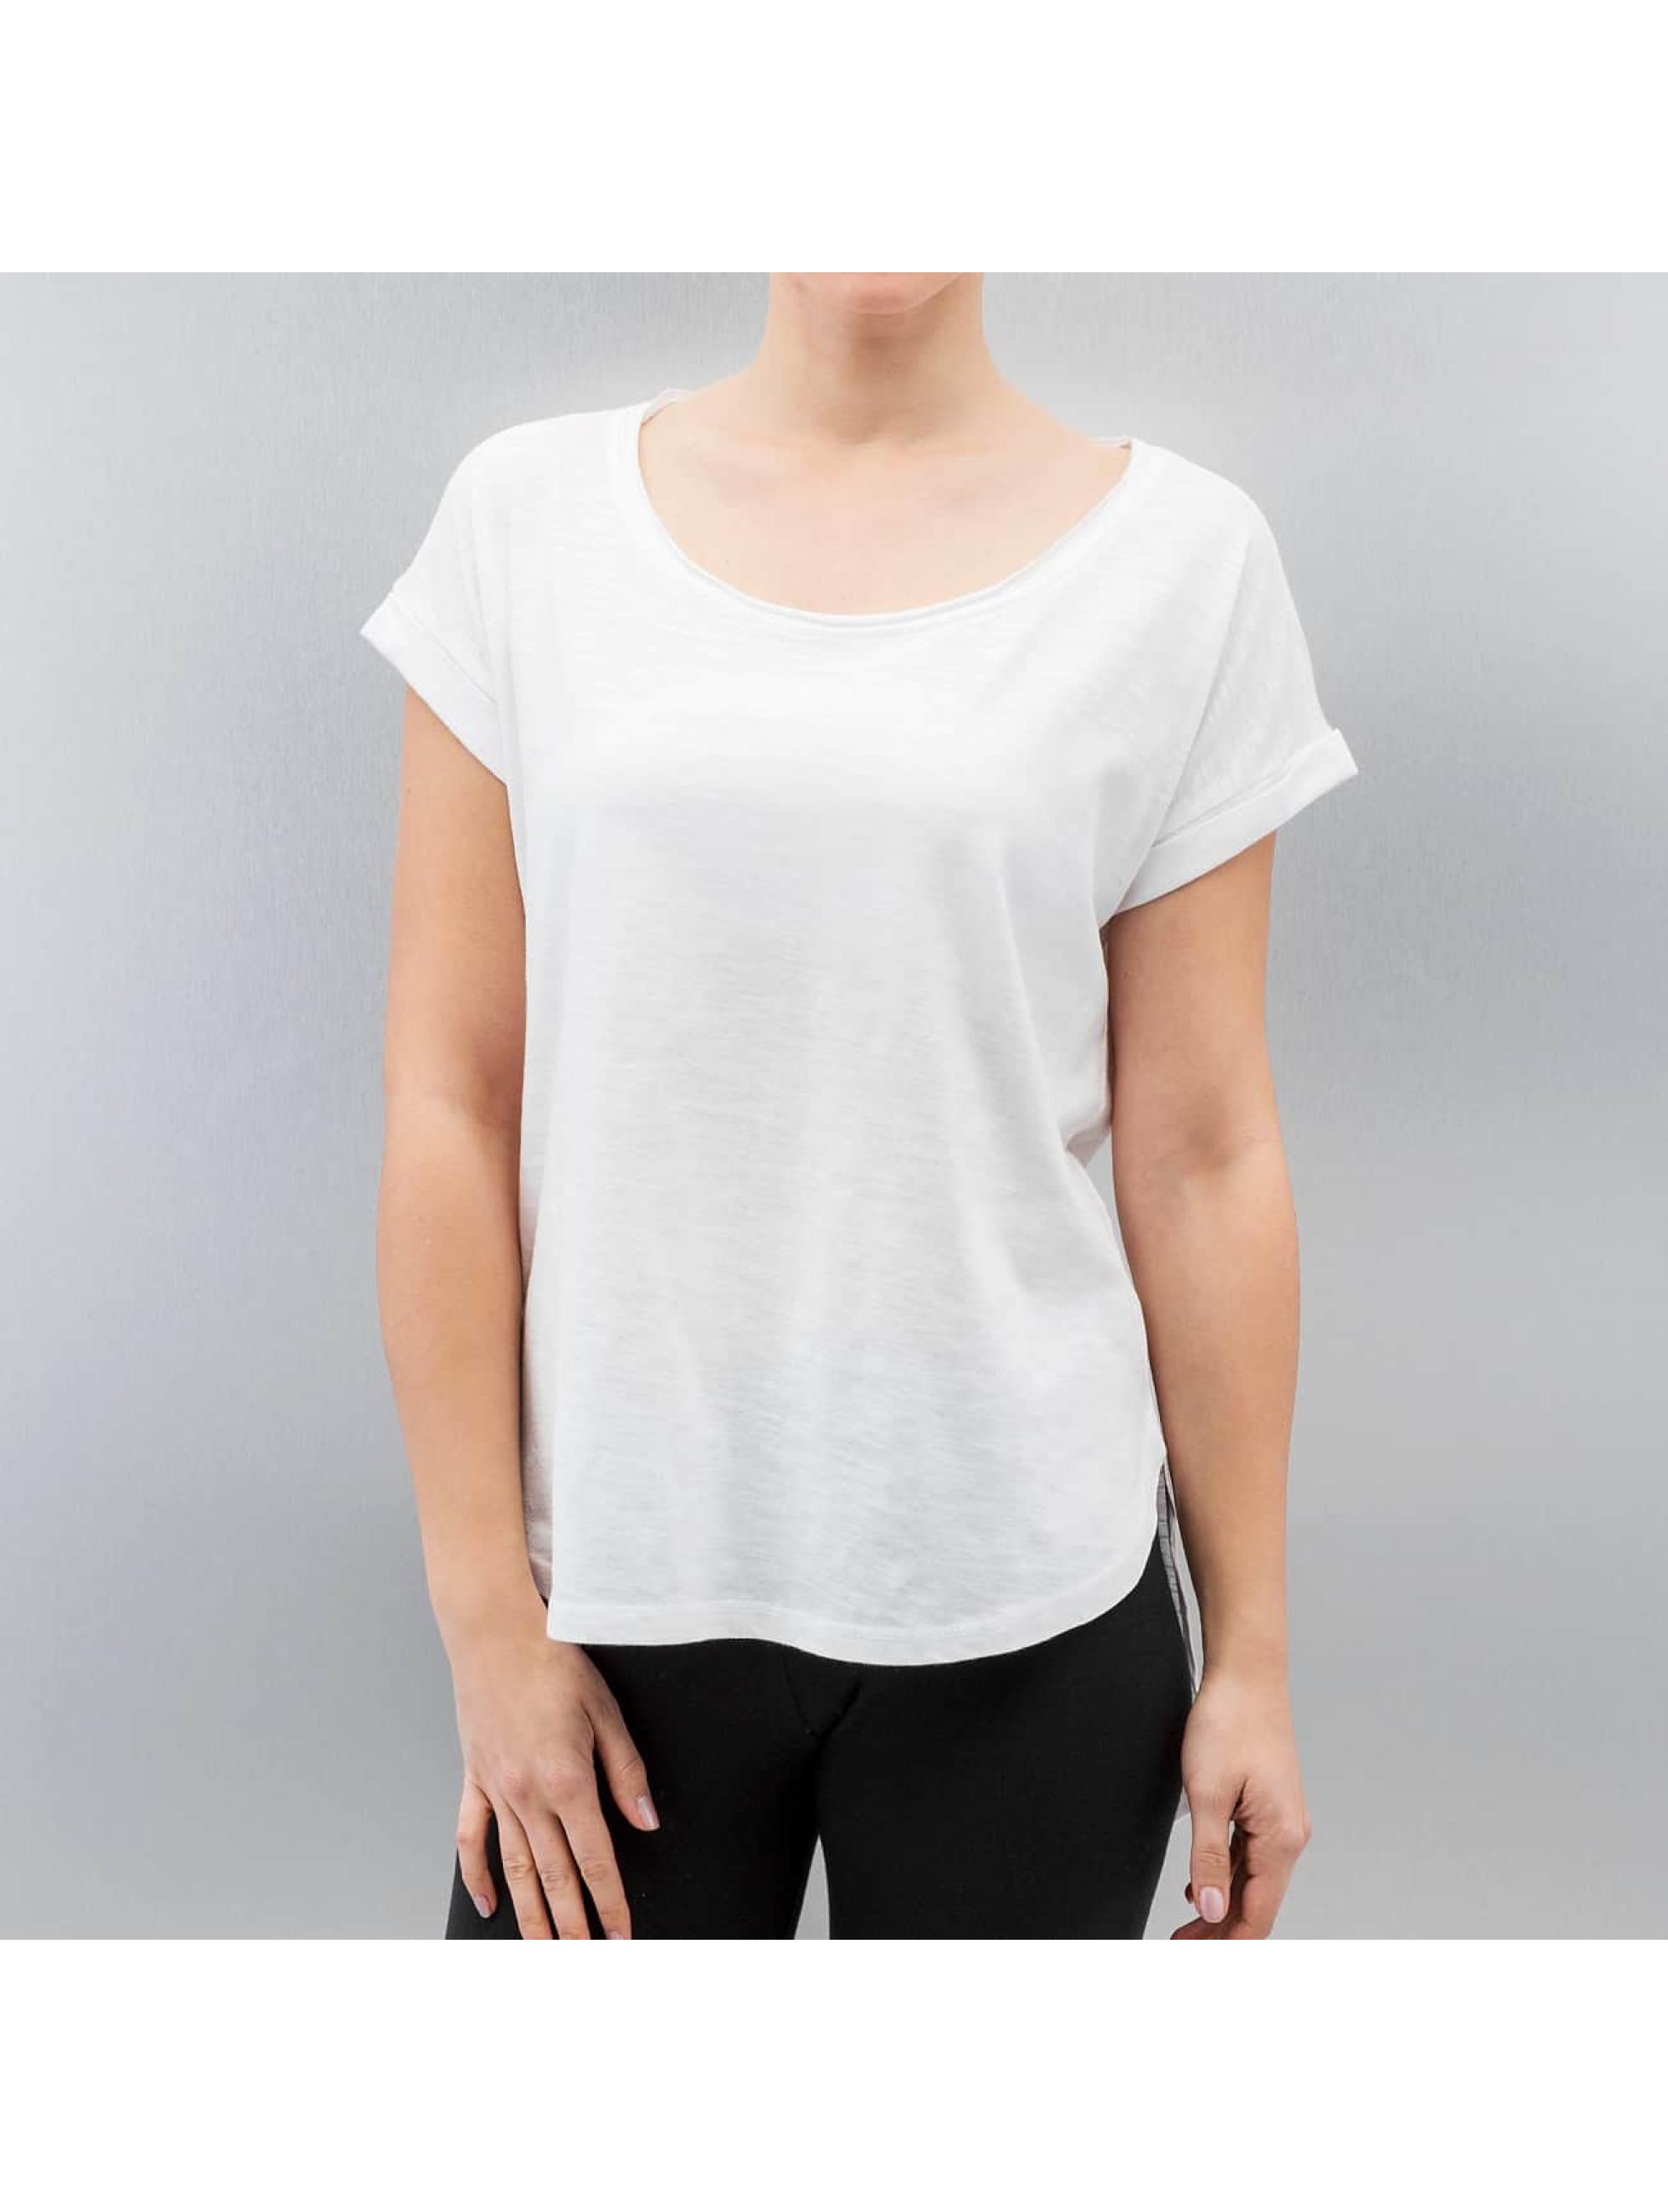 Urban Classics Haut / T-Shirt Shaped Slub en blanc